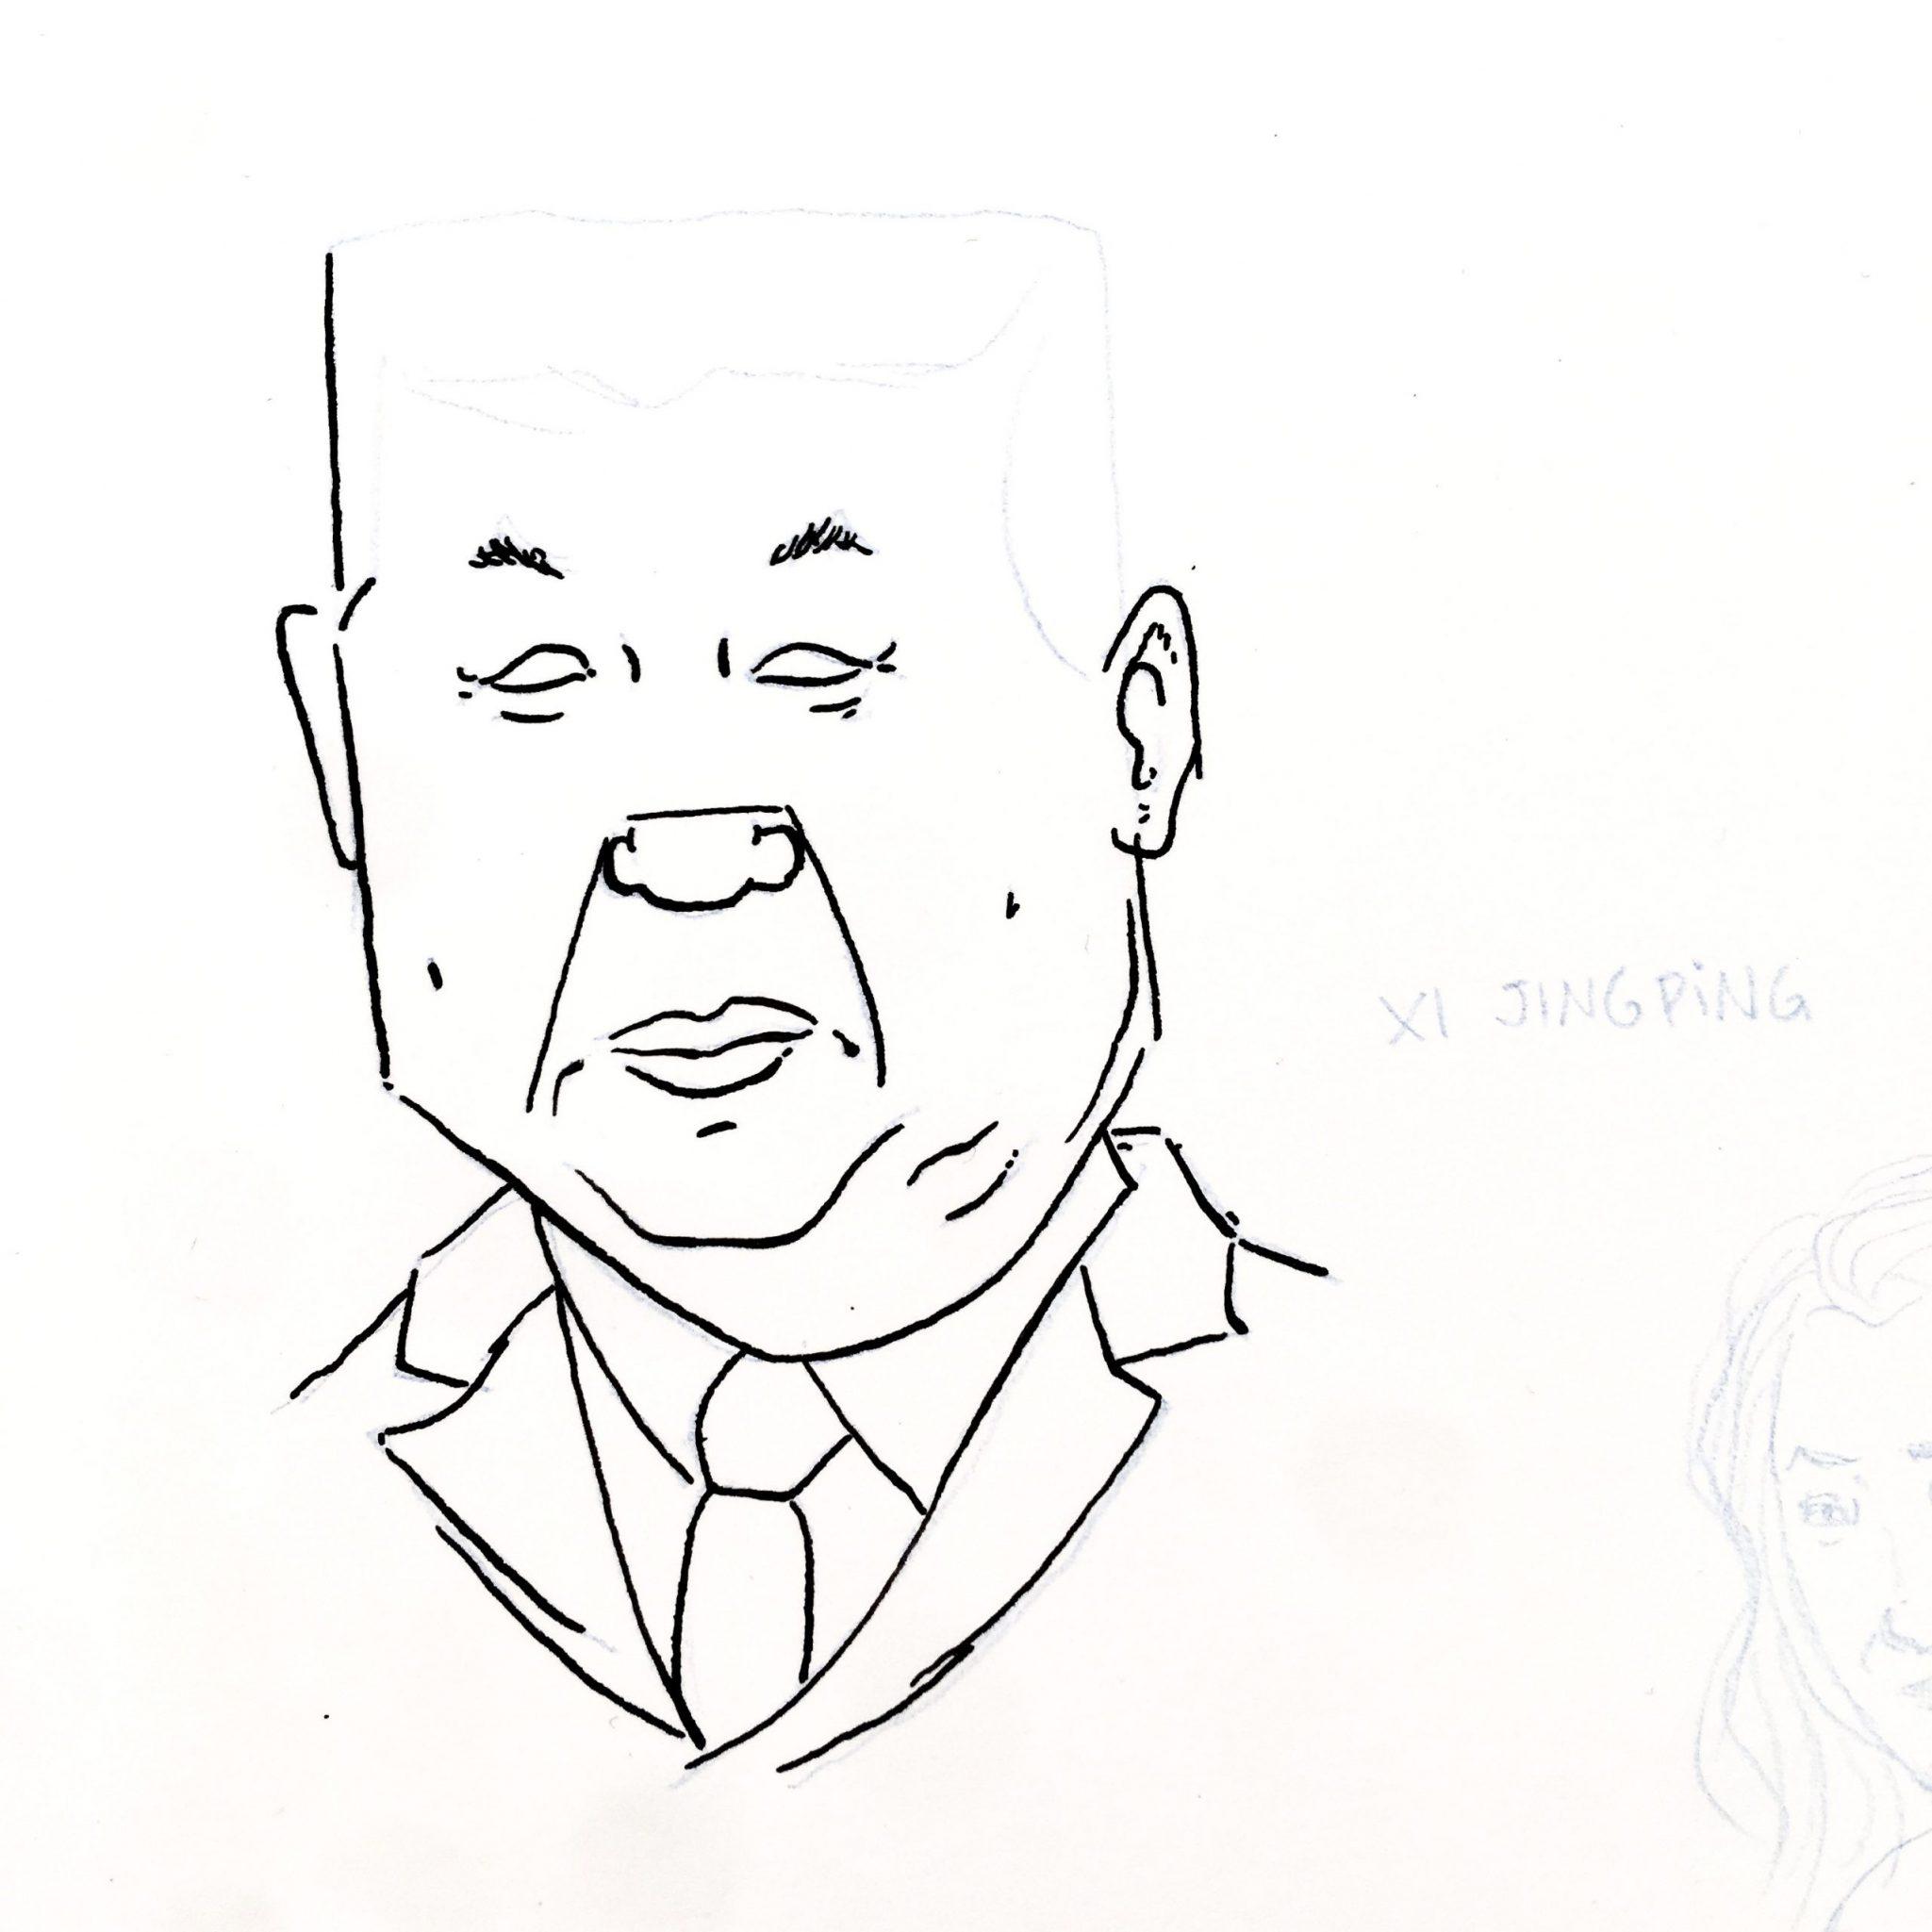 Boceto de un dibujo en tinta sobre papel del presidente de China Xi Jingping